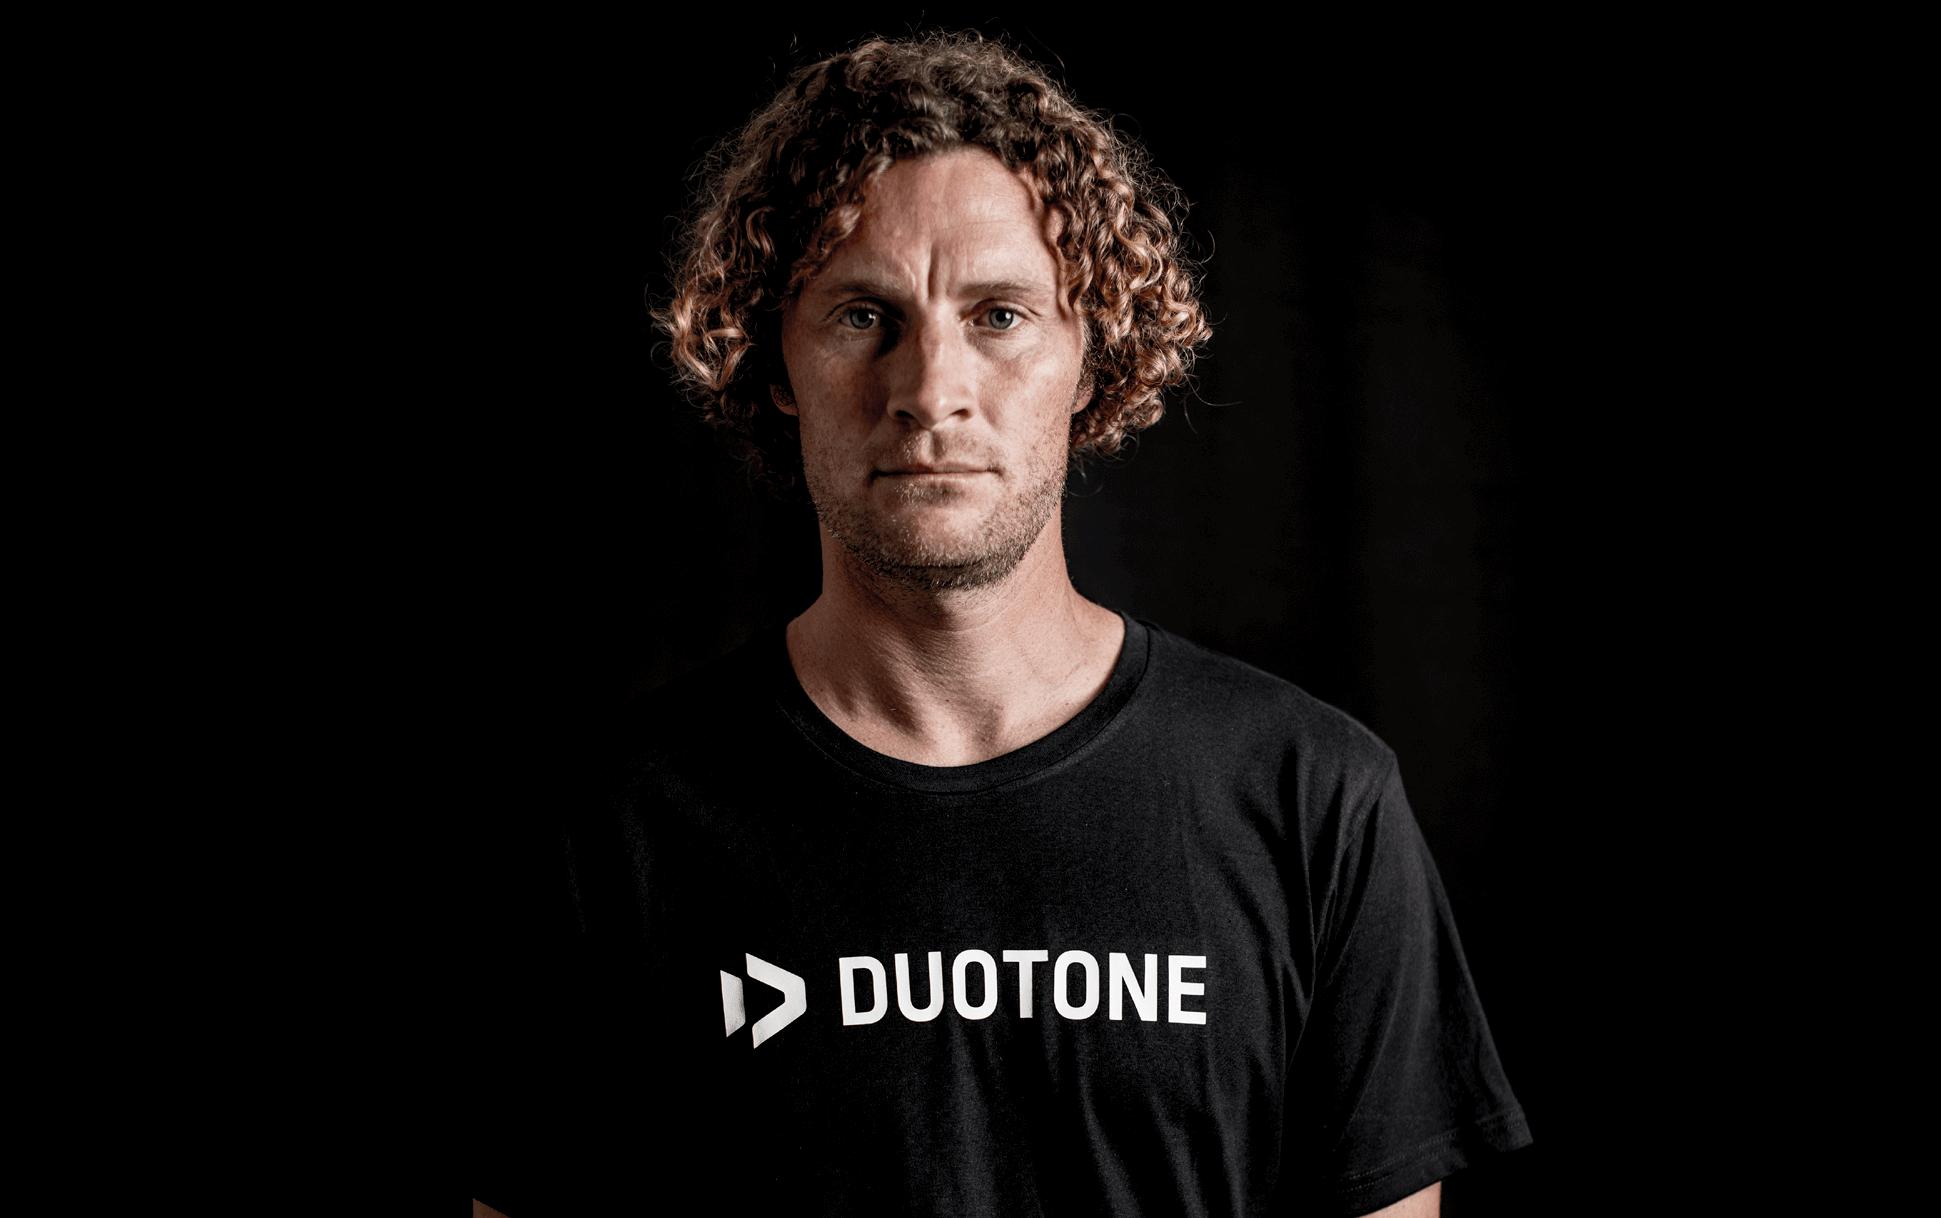 Duotone_Kitebarding_Interview_Spirit_Foil_Sky_Solbach